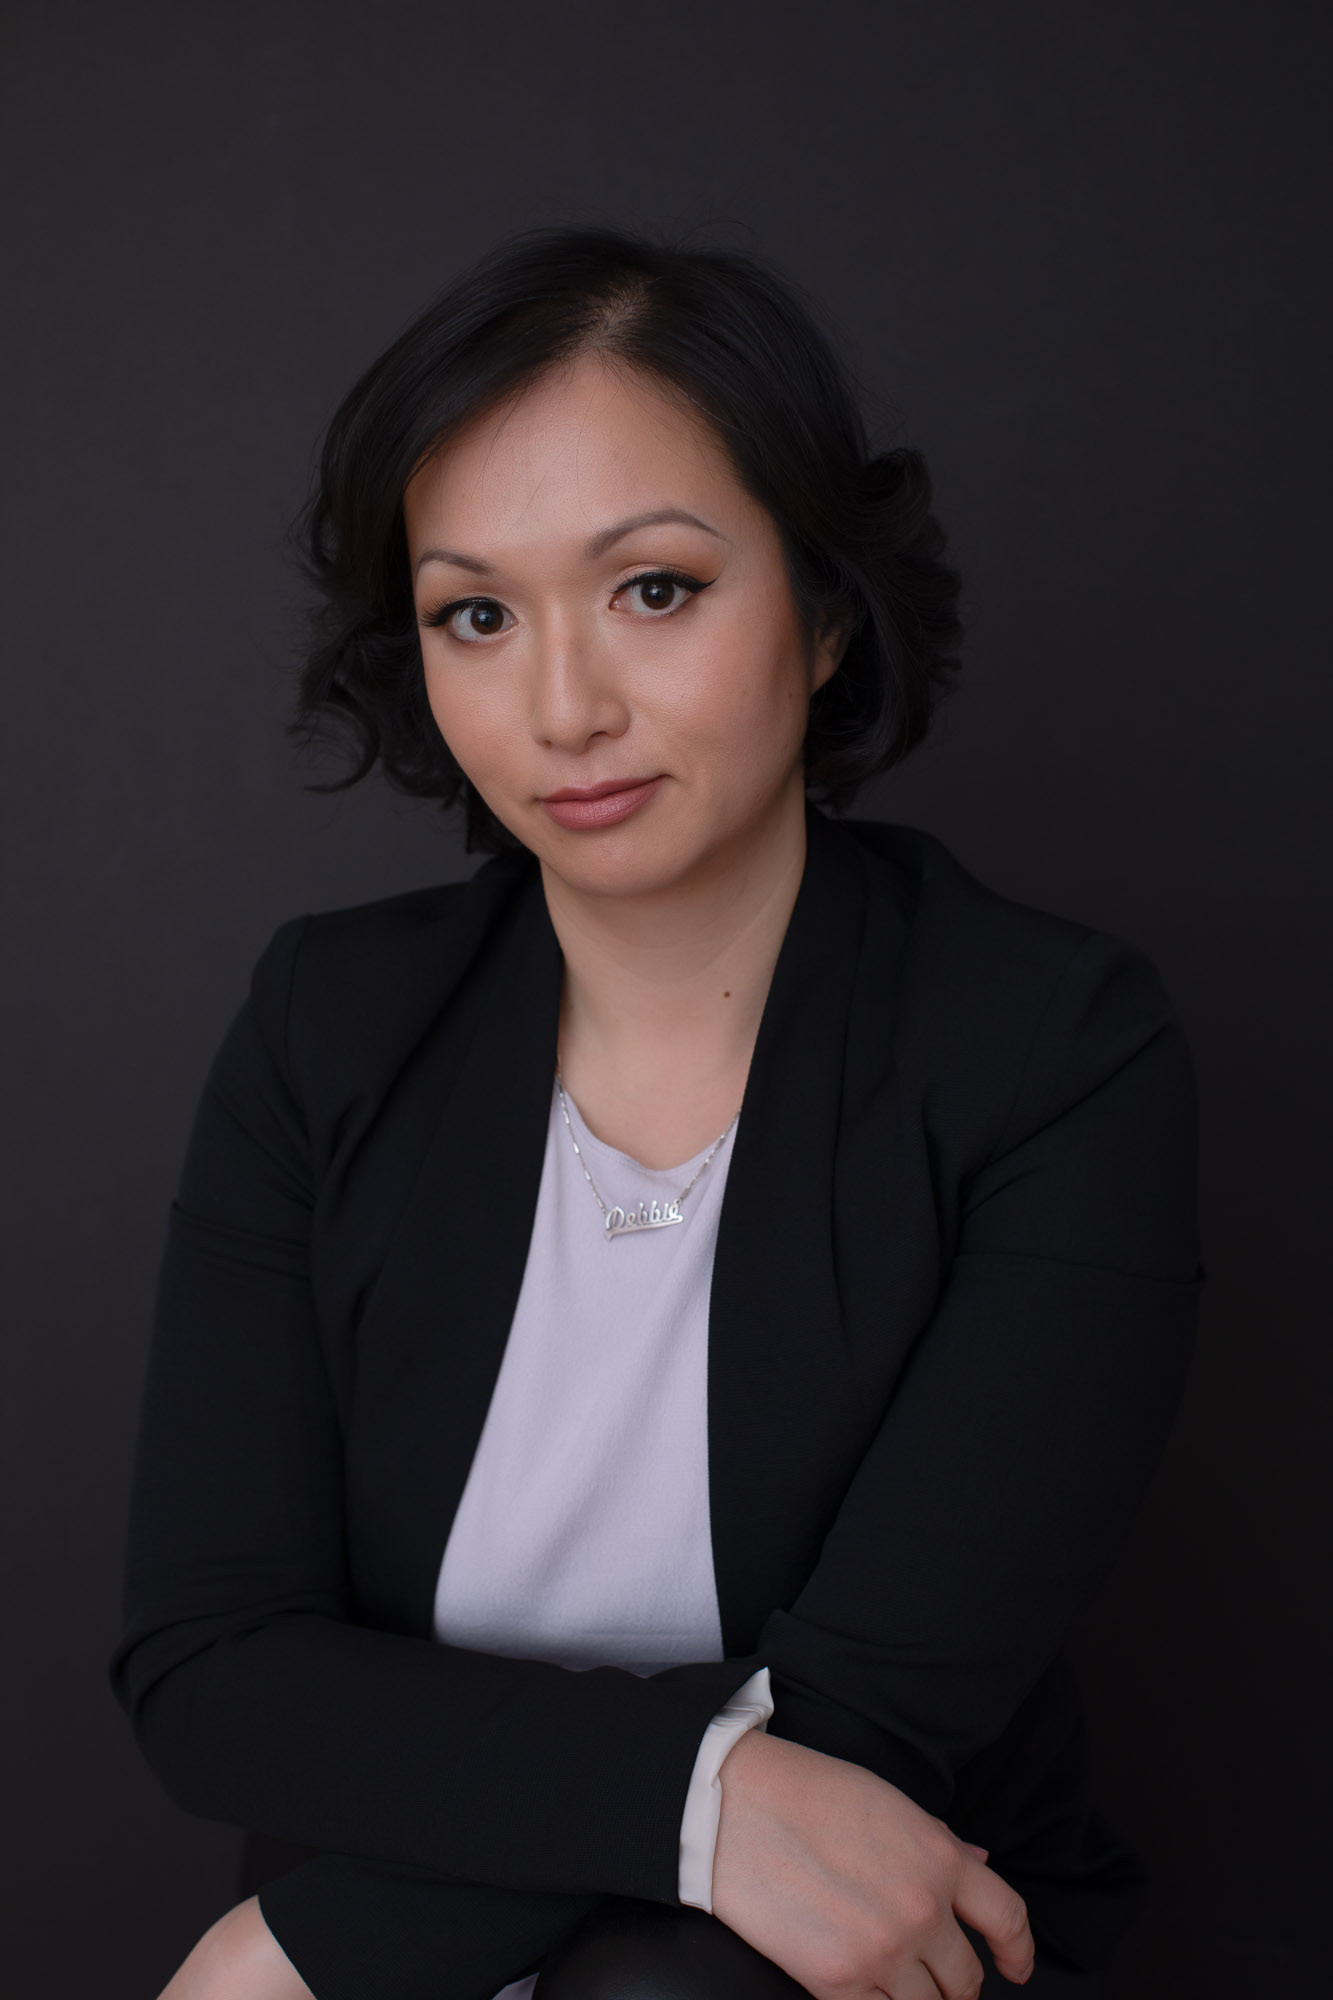 Luxury Real Estate Agent Debbie Victoria